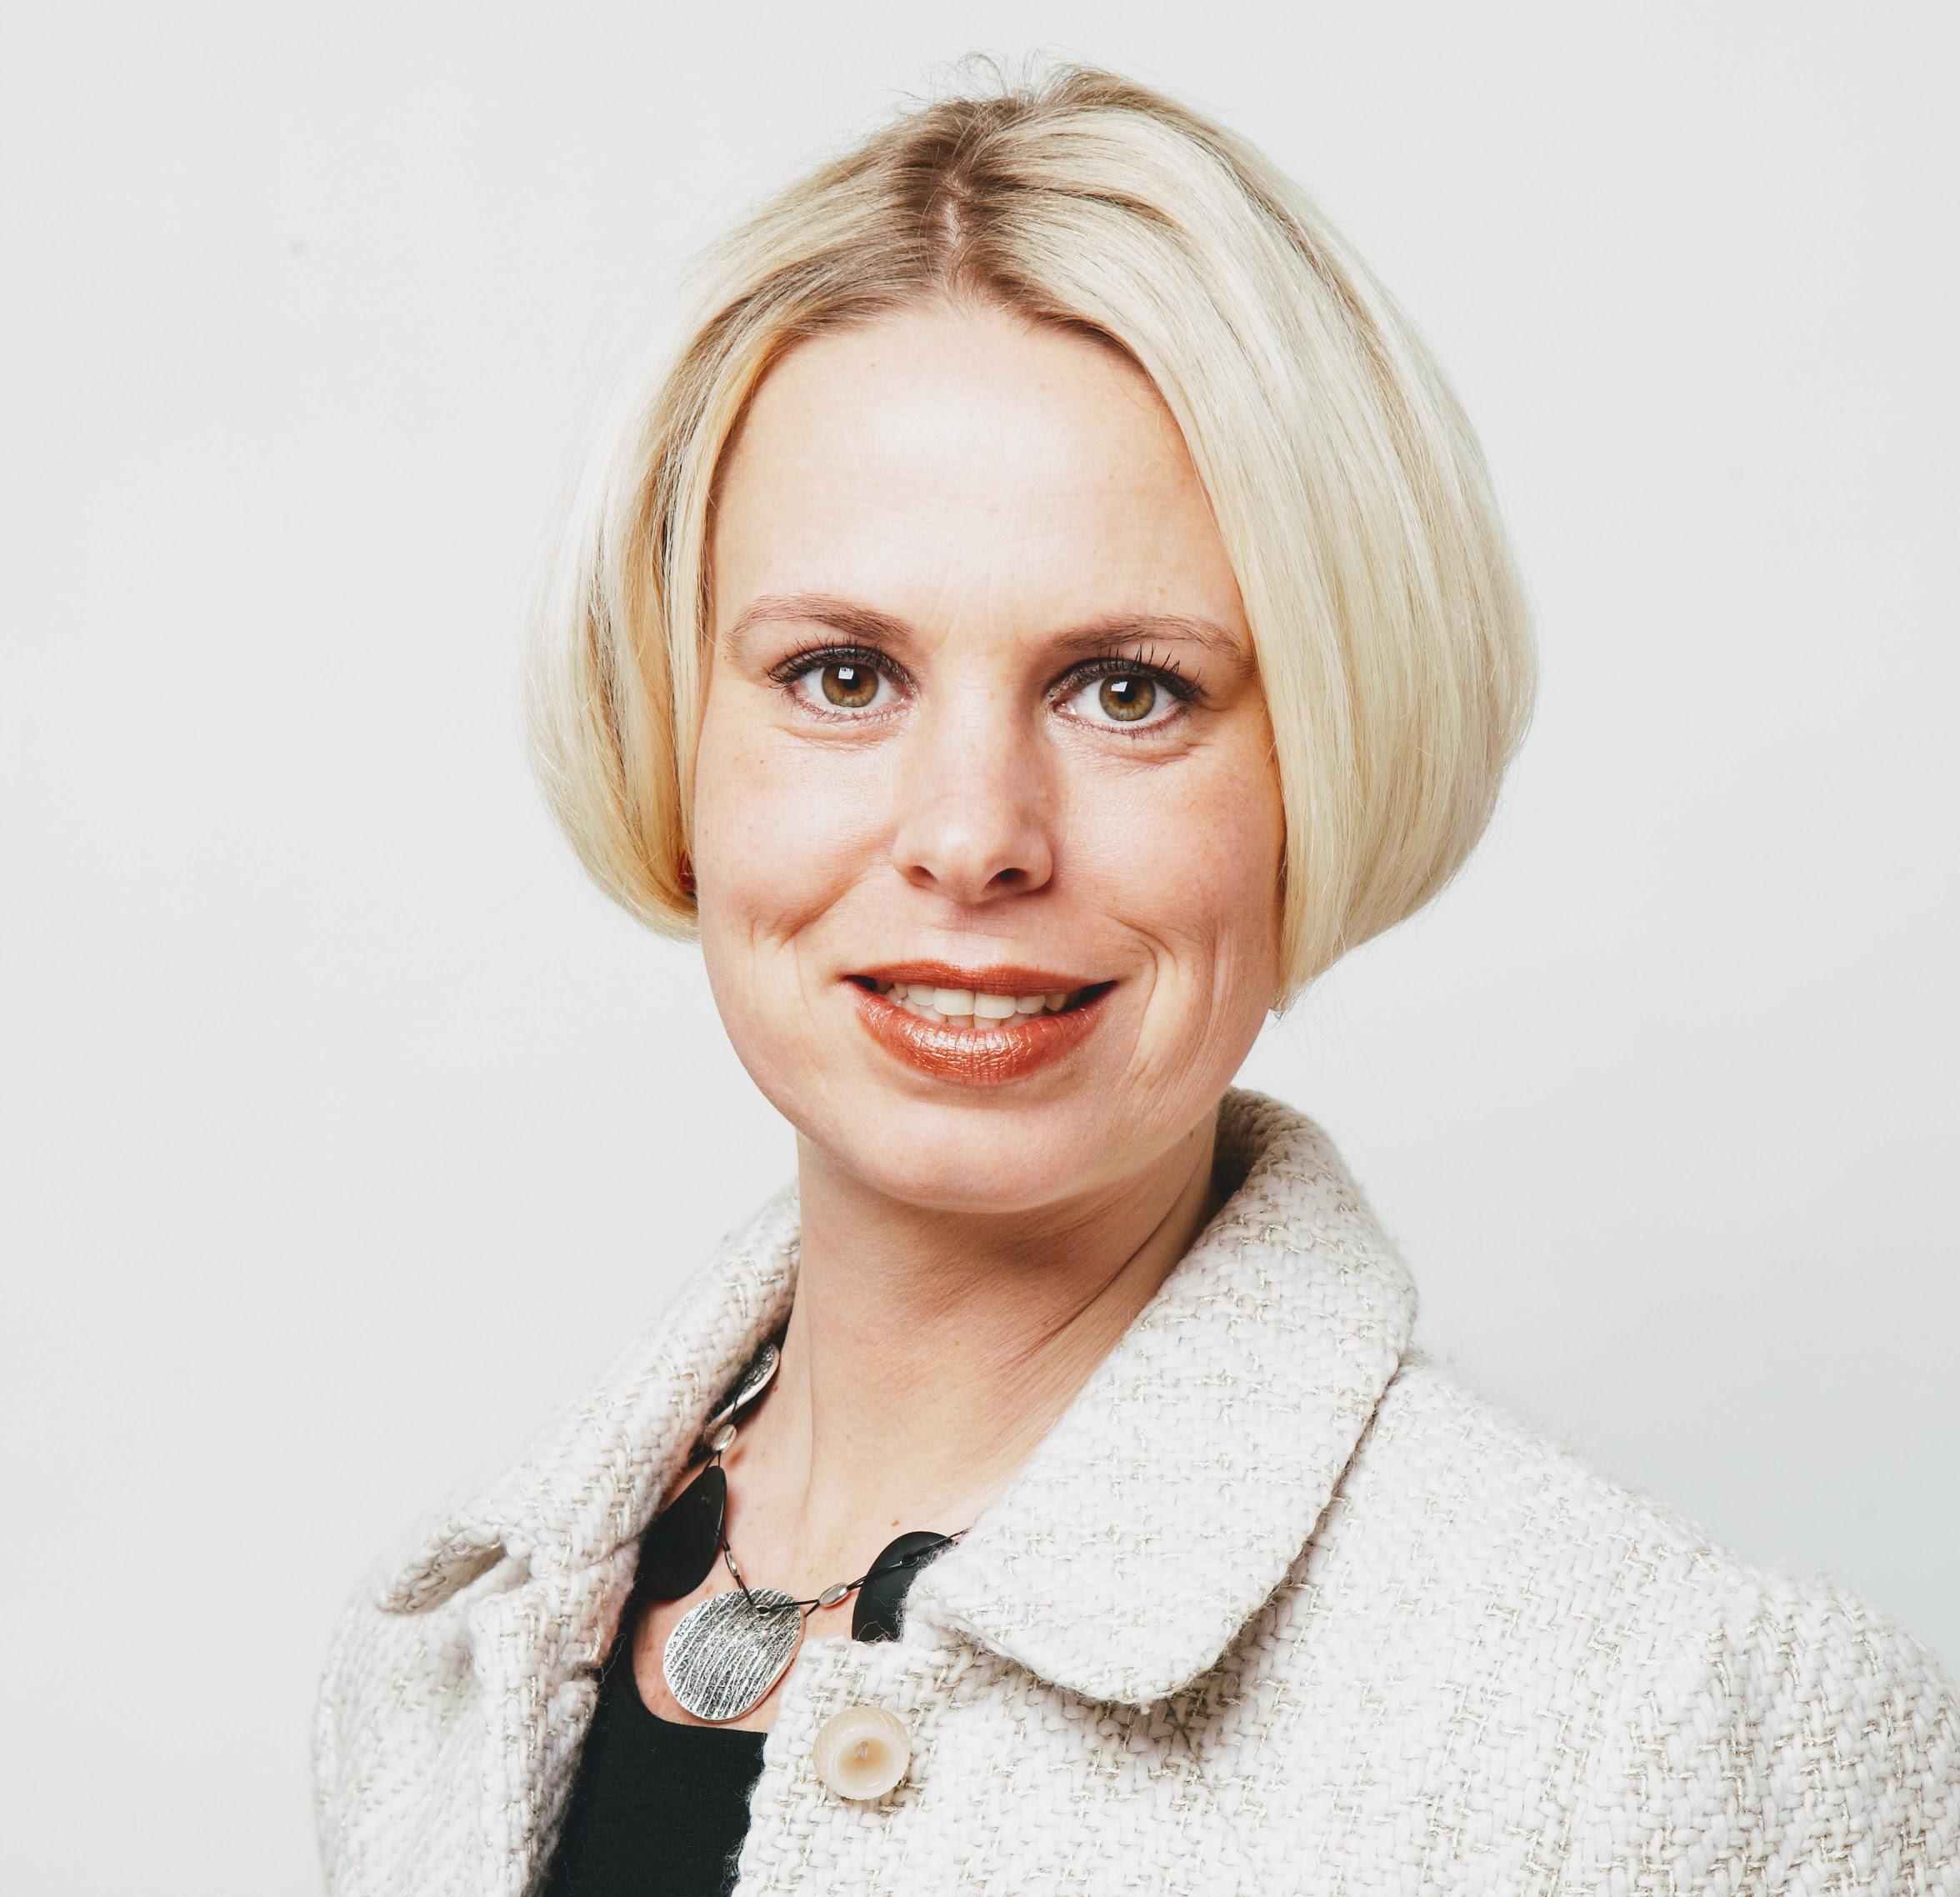 Rechtsanwältin Dr. Annette Linkhorst